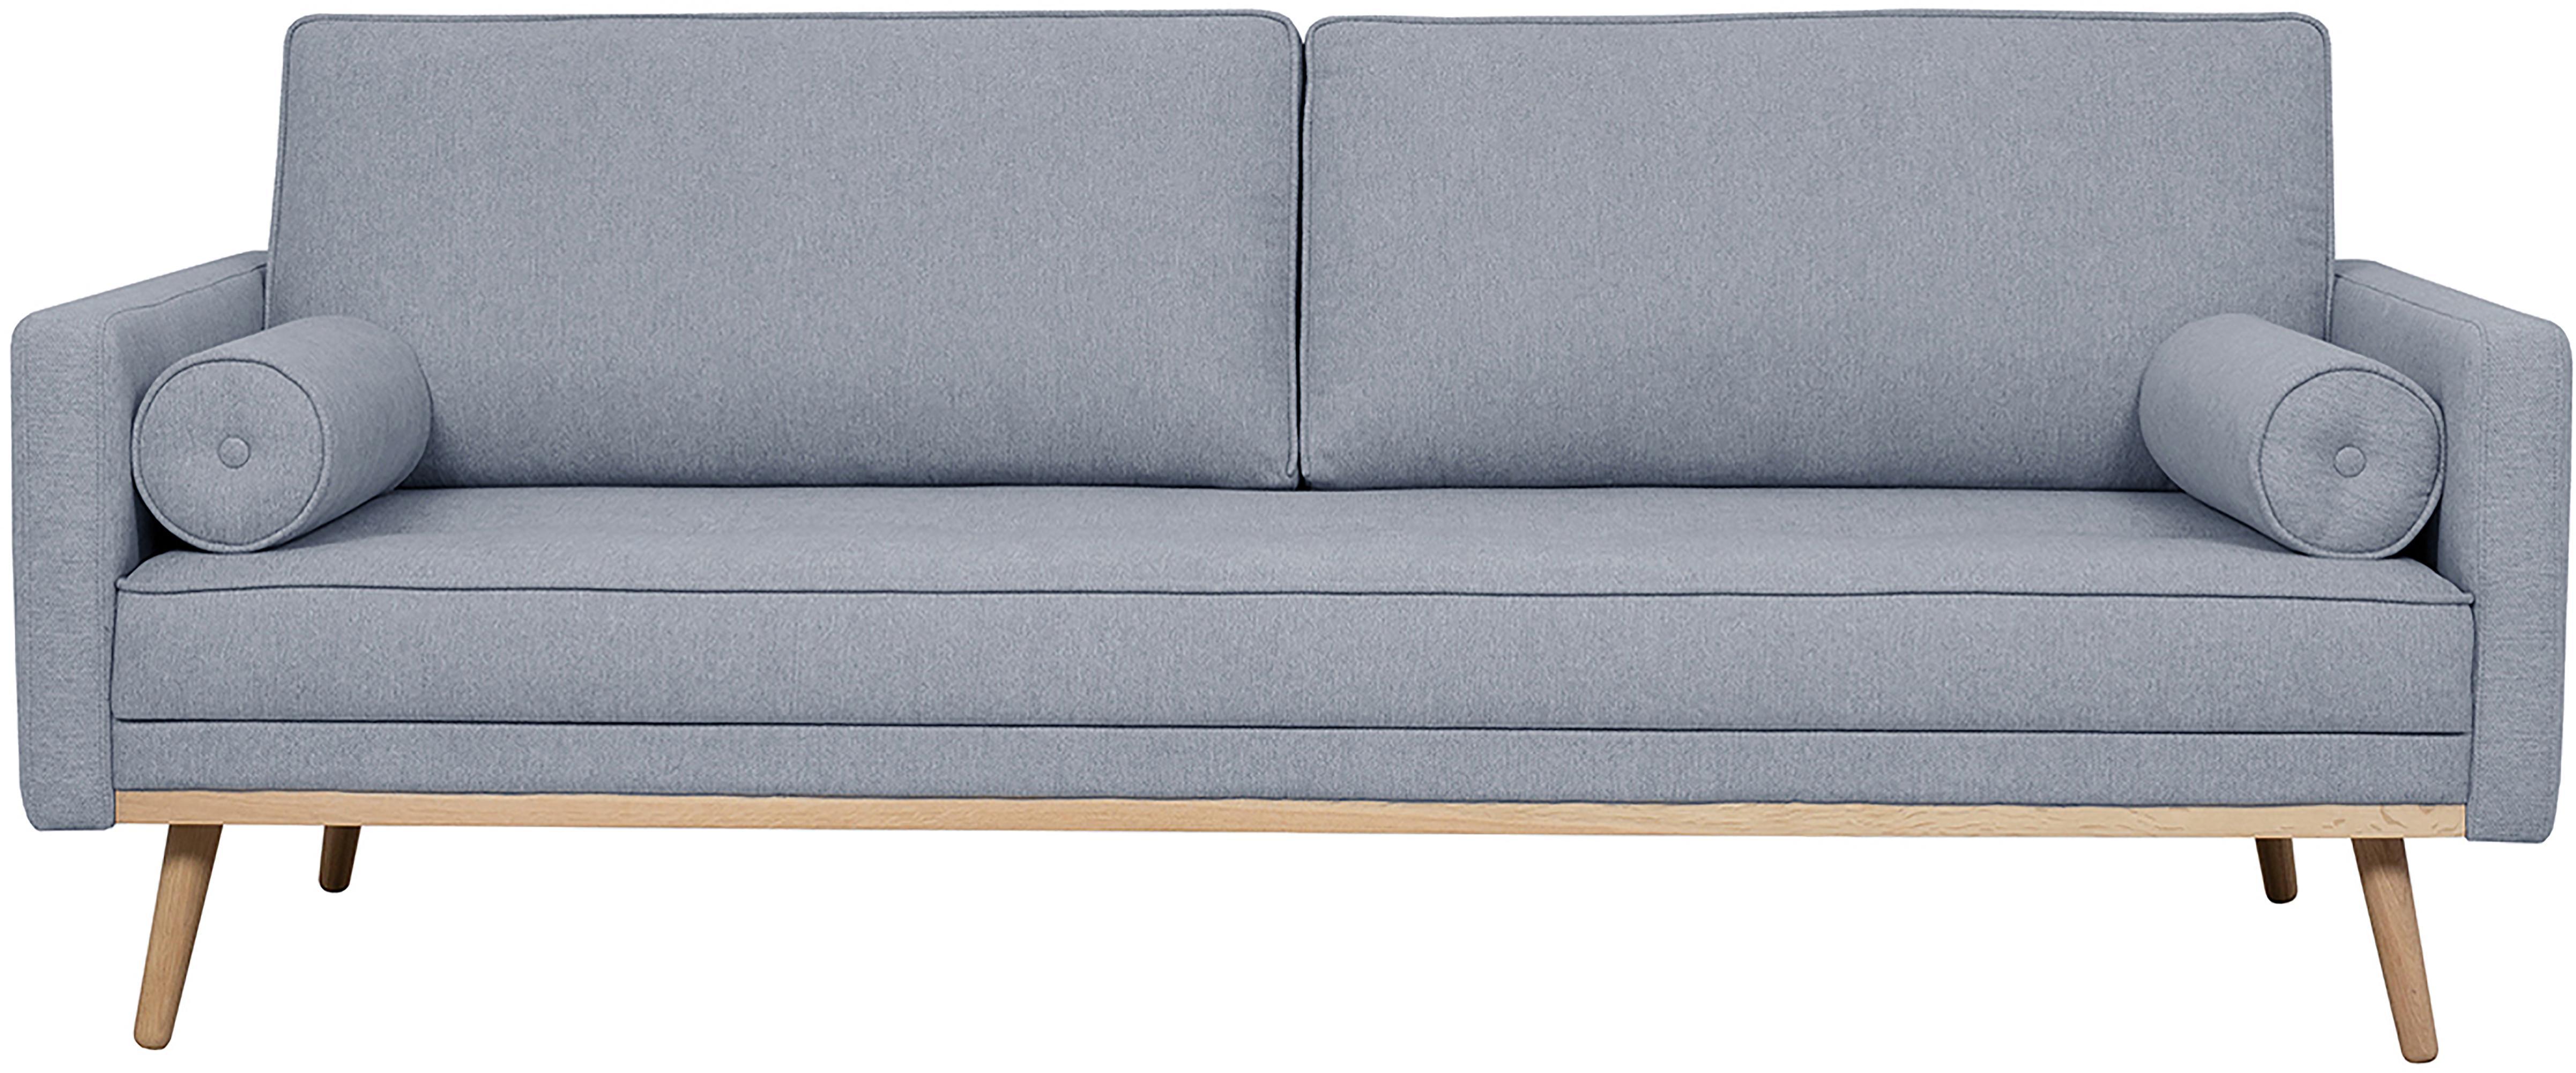 Bank Saint (3-zits), Bekleding: polyester, Frame: massief grenenhout, spaan, Blauwgrijs, 210 x 70 cm